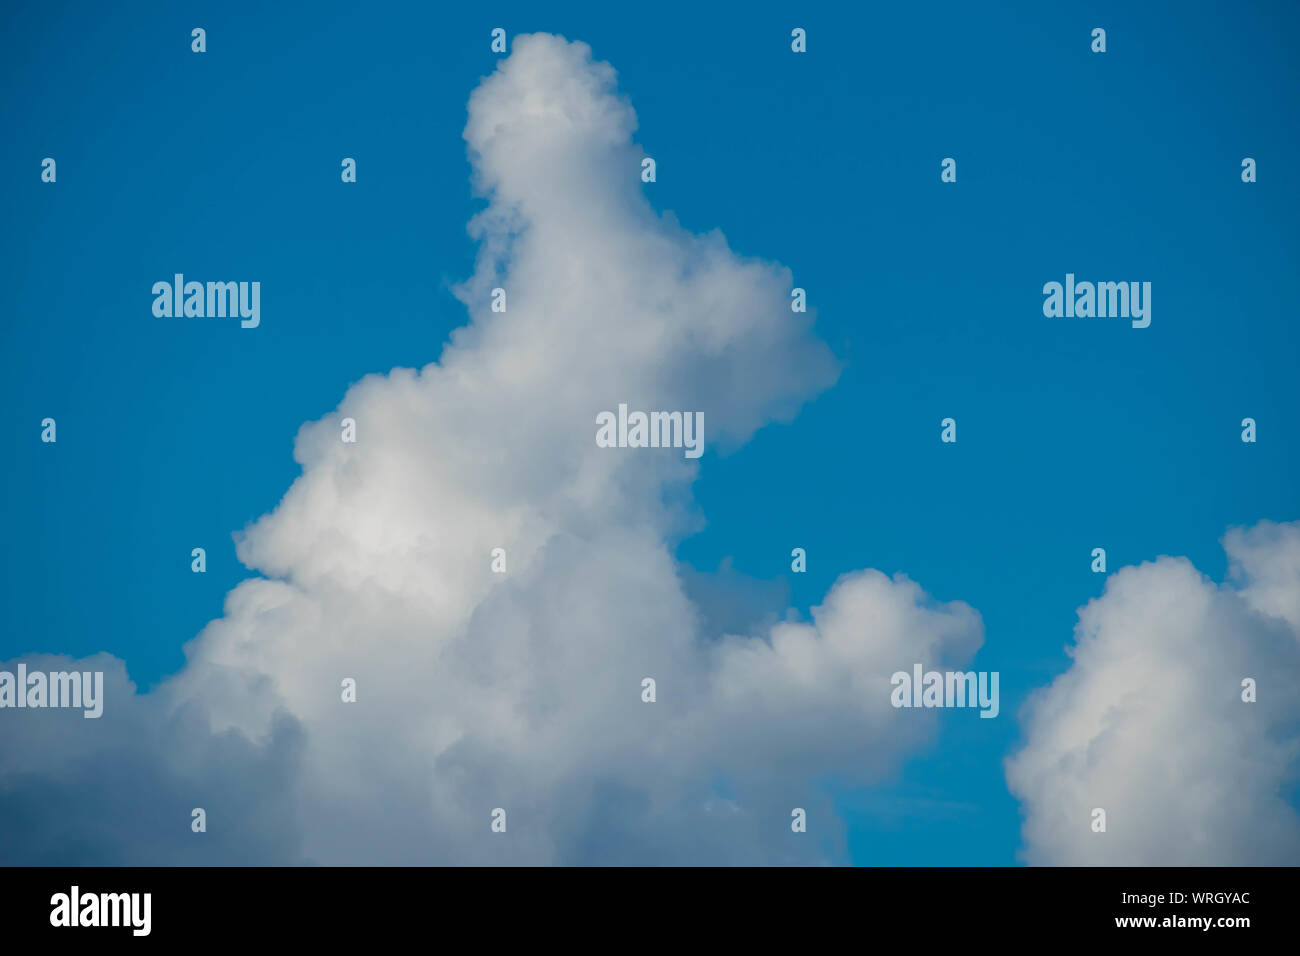 Orlando, Florida. August 31, 2019. Rabbit shaped cloud on bluelight sky background. Stock Photo